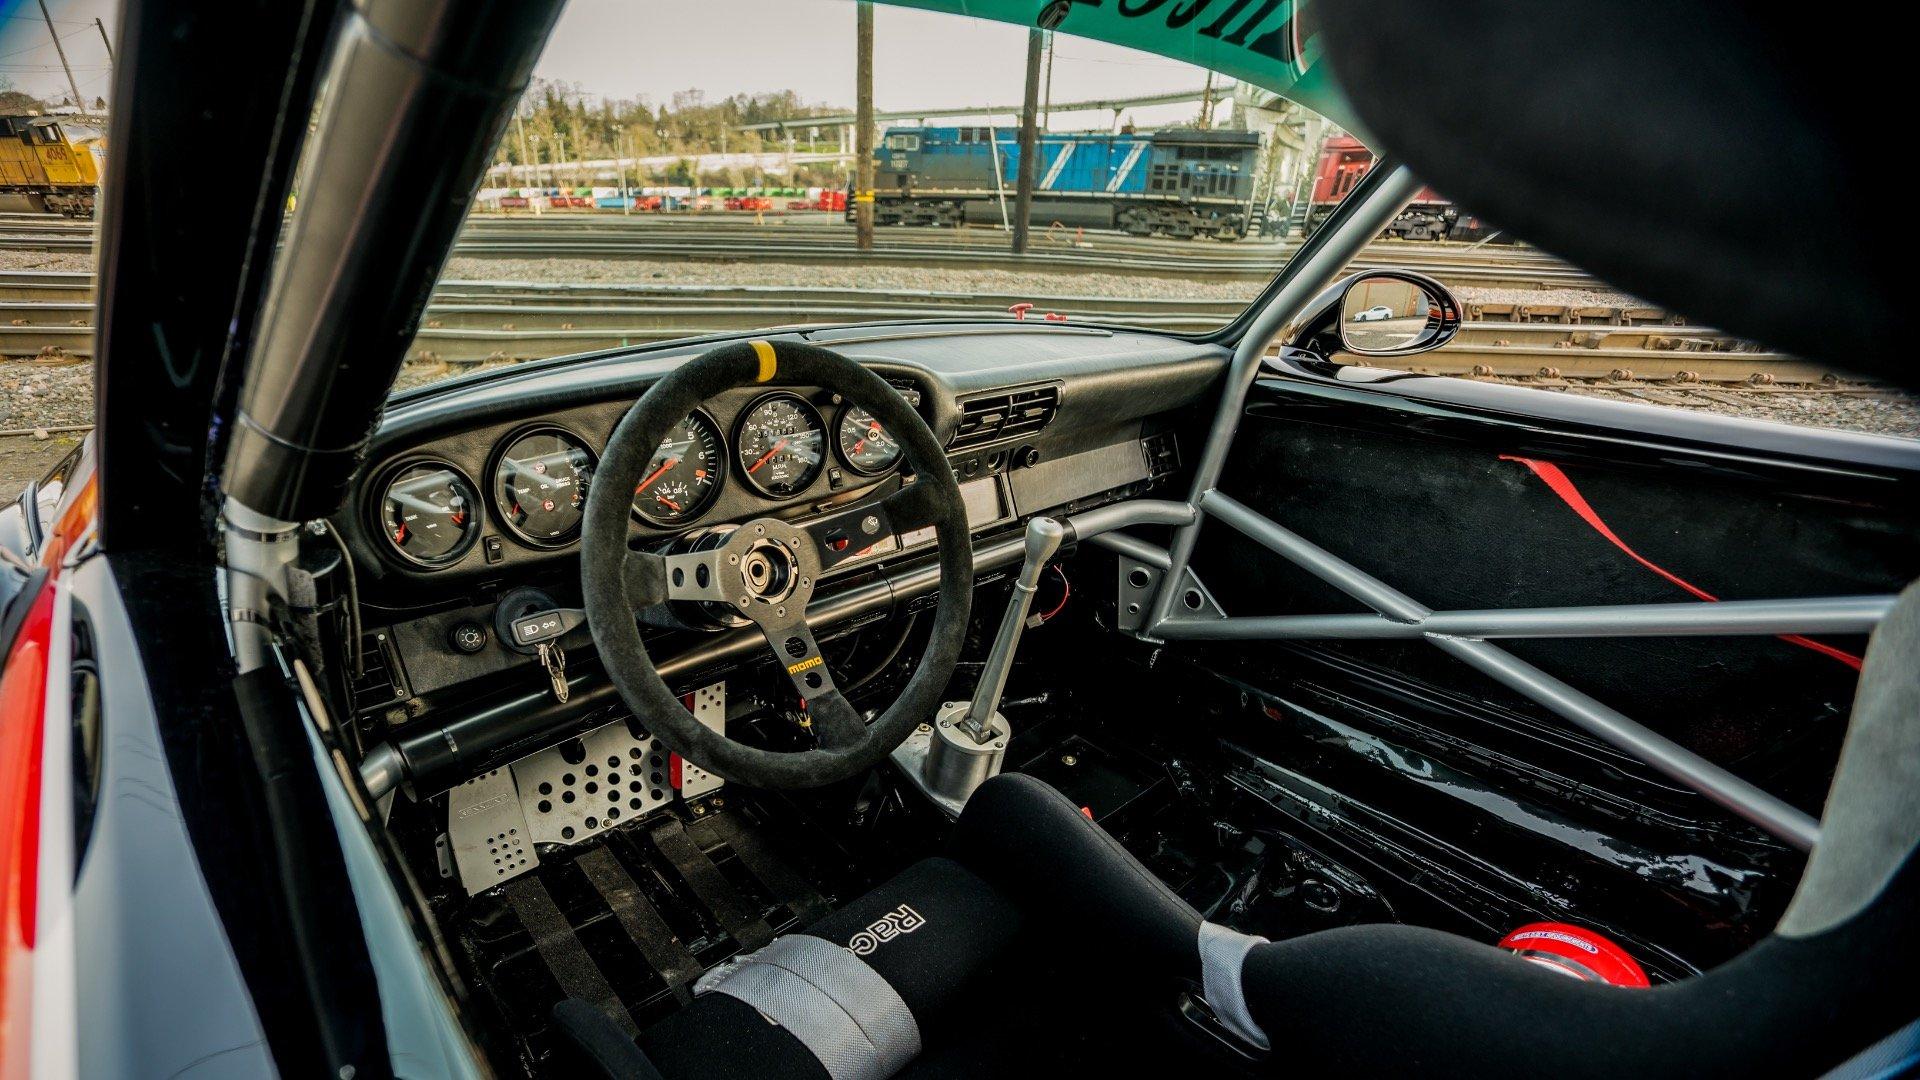 1986 Porsche Interscope 934.5 Race Car $127k spent  $159.9 For Sale (picture 4 of 6)